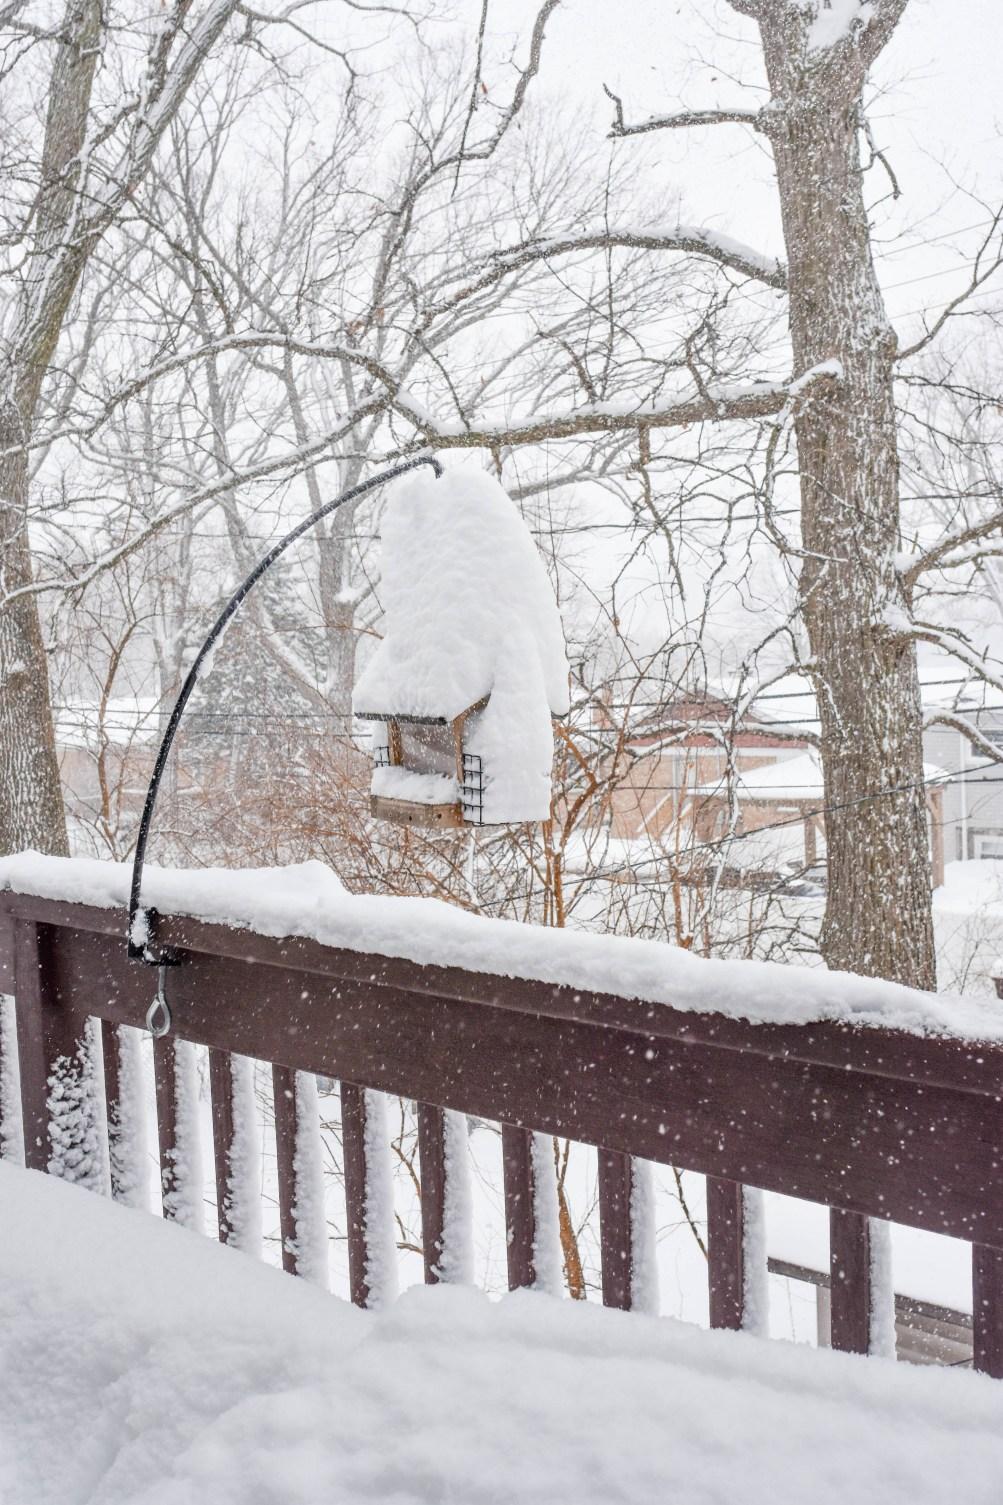 January 2021 Chicago Snowstorm Photo Diary